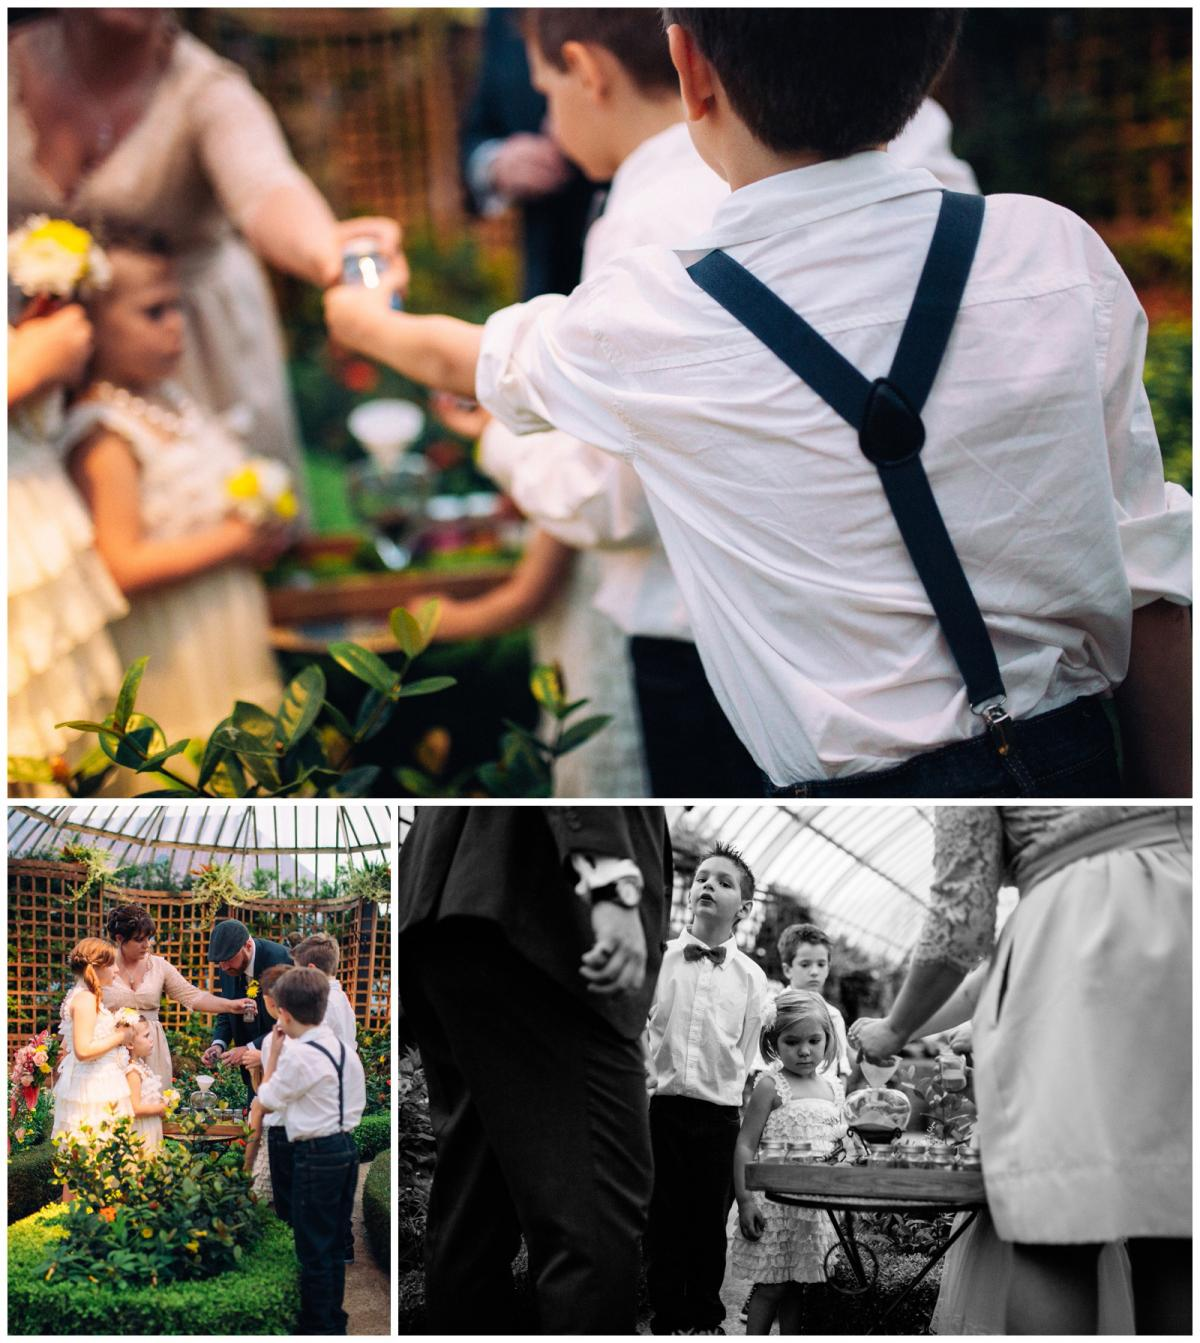 wild-native-photography-wedding-pittsburgh-phipps-blake21